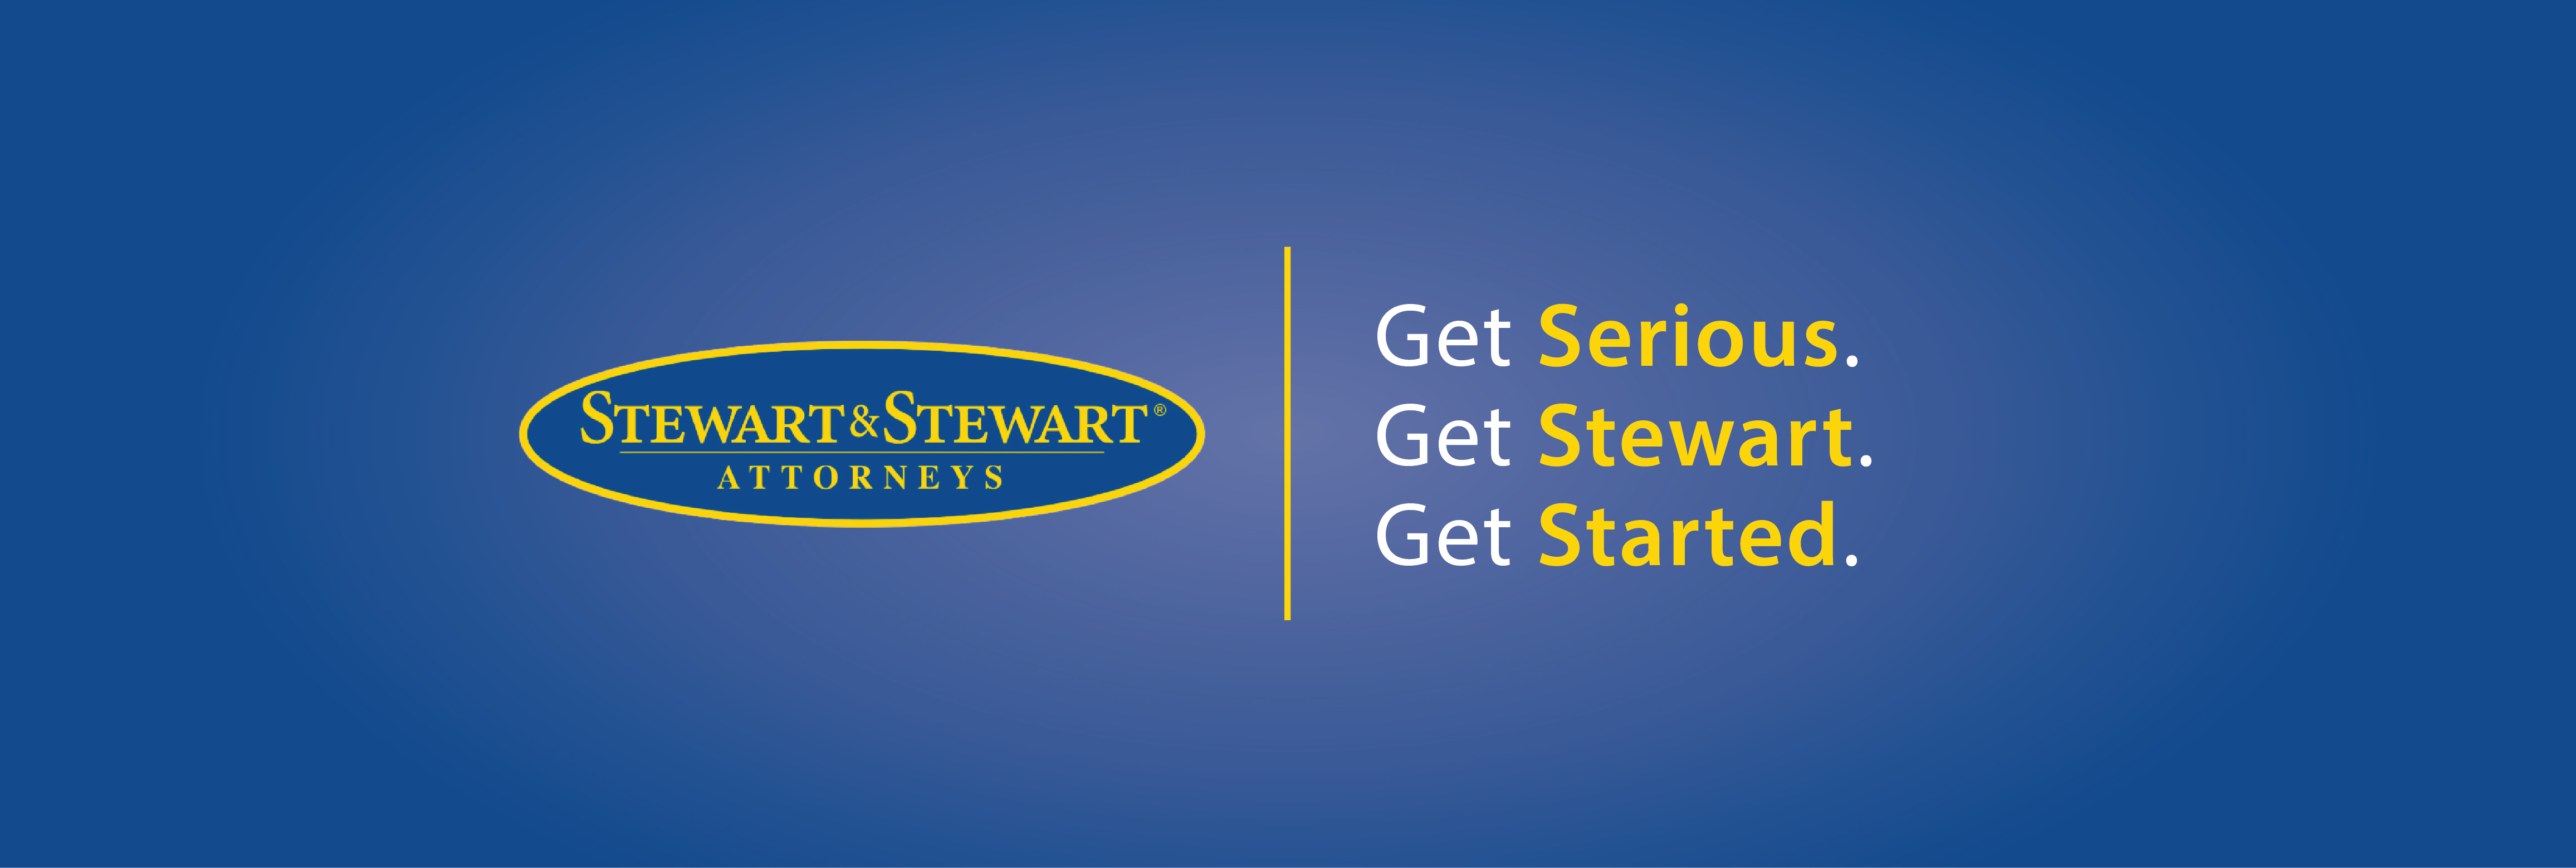 Stewart & Stewart Attorneys reviews | Personal Injury Law at 931 S Rangeline Rd - Carmel IN